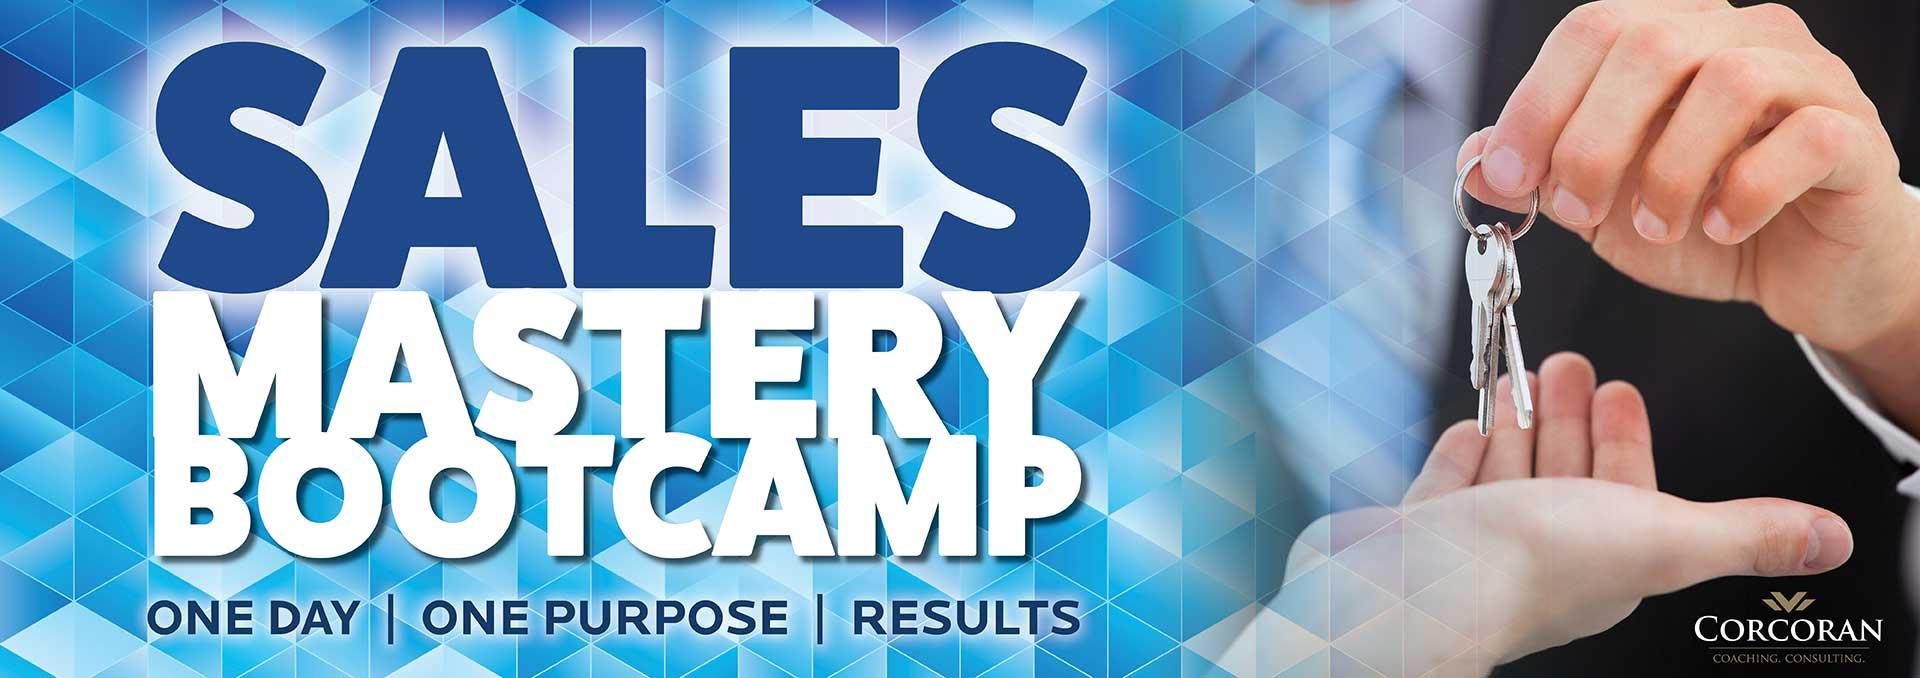 Corcoran Sales Mastery BootCamp